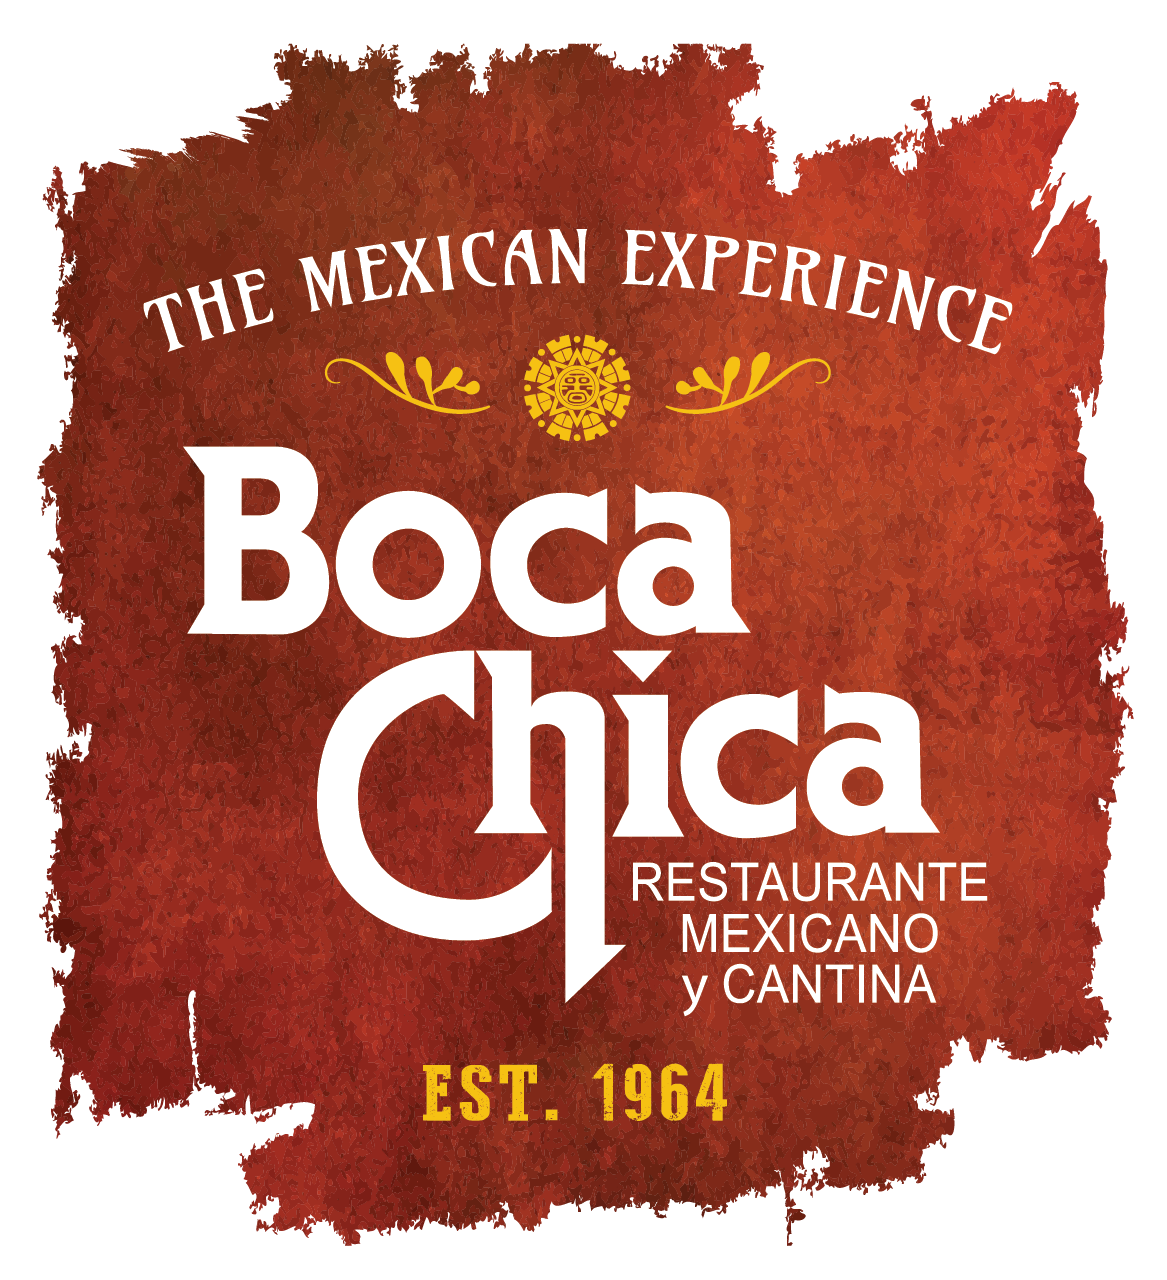 BocaChica-Logo-RidgeBackground-01 (1).png